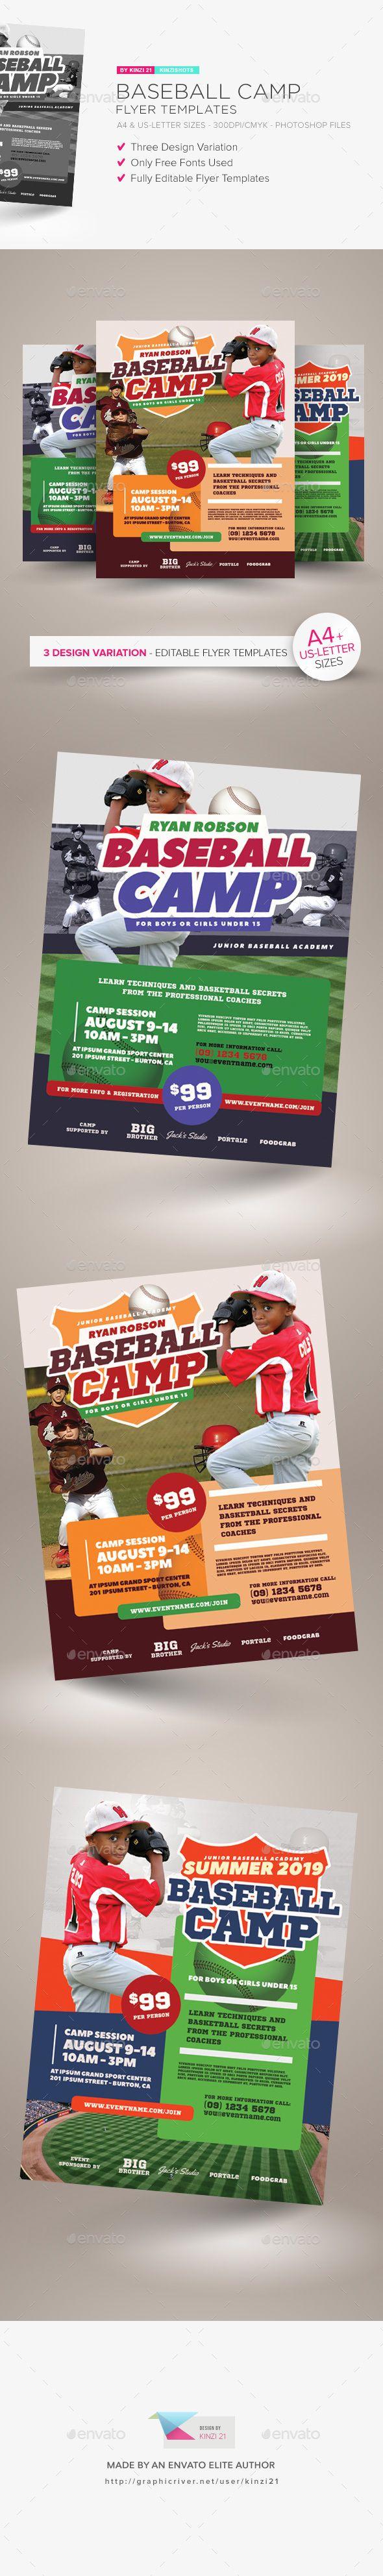 Baseball Camp Flyer Templates — Photoshop PSD #coaching #cap • Download ➝ https://graphicriver.net/item/baseball-camp-flyer-templates/21153665?ref=pxcr